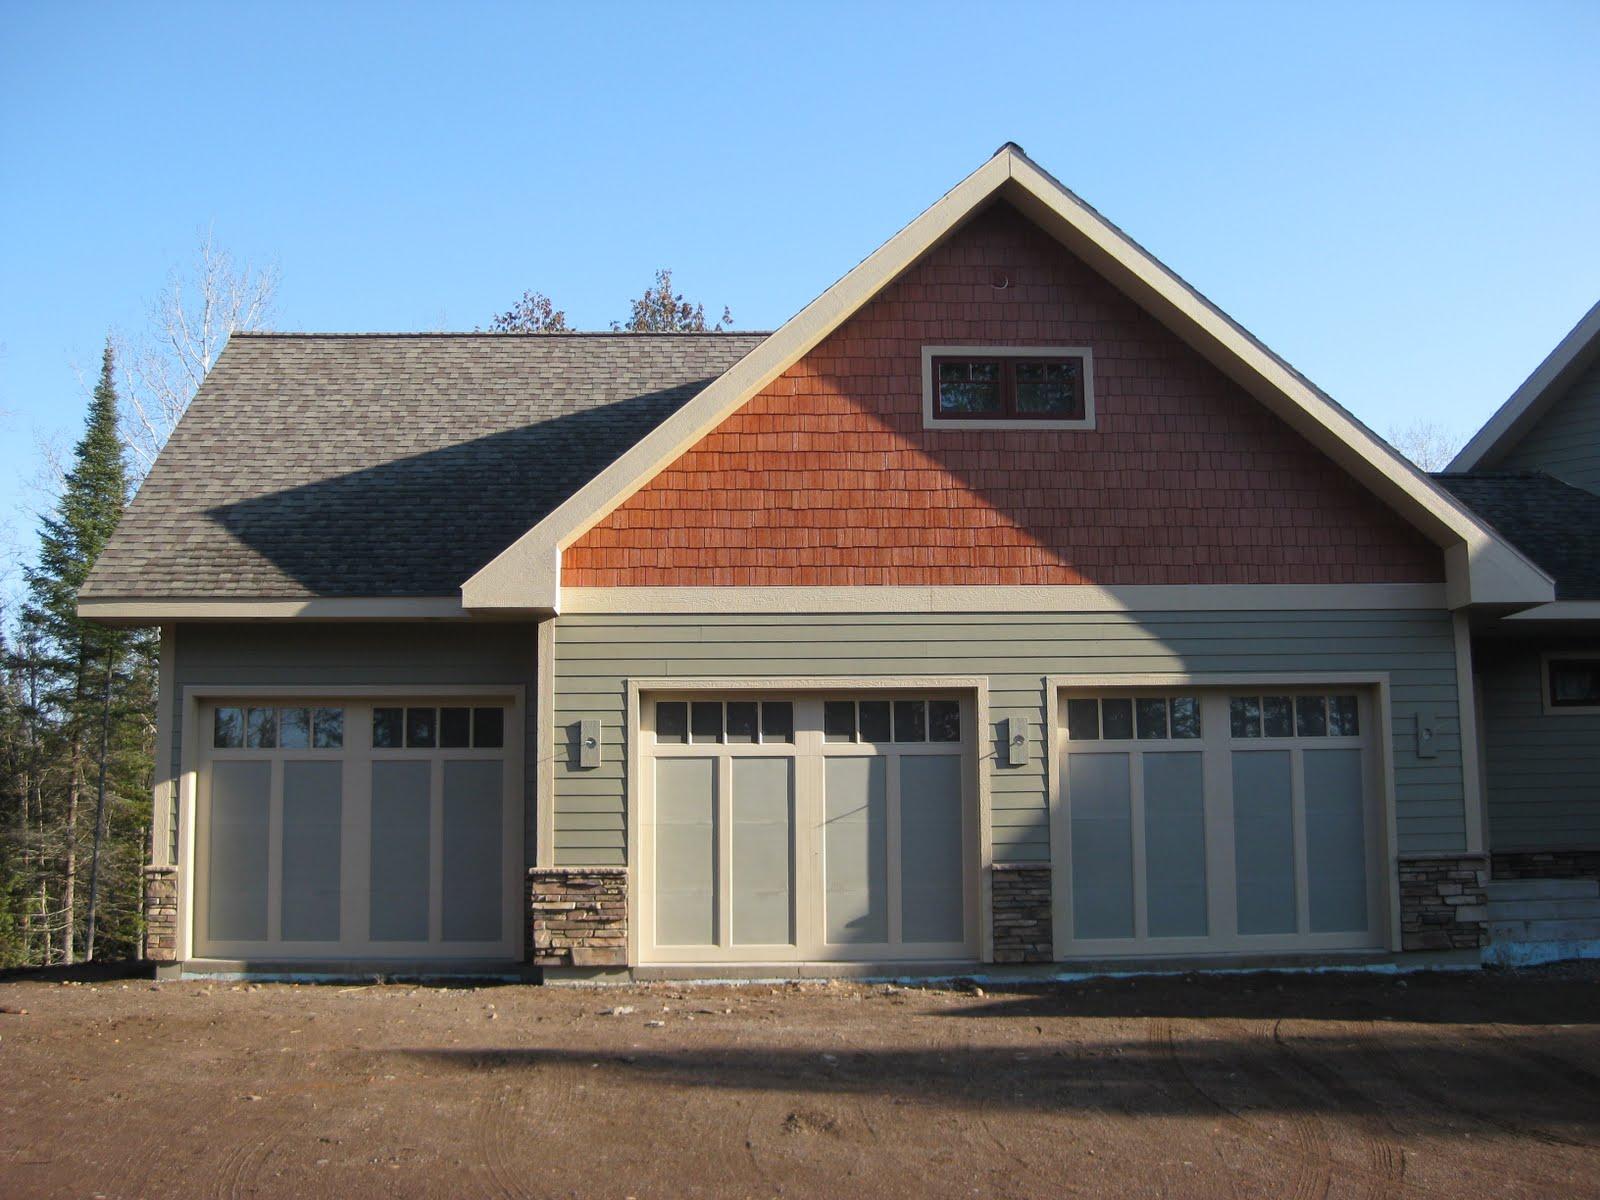 1200 #0569C6 The Beautiful Garage Doors! pic Beautiful Garage Doors 38011600